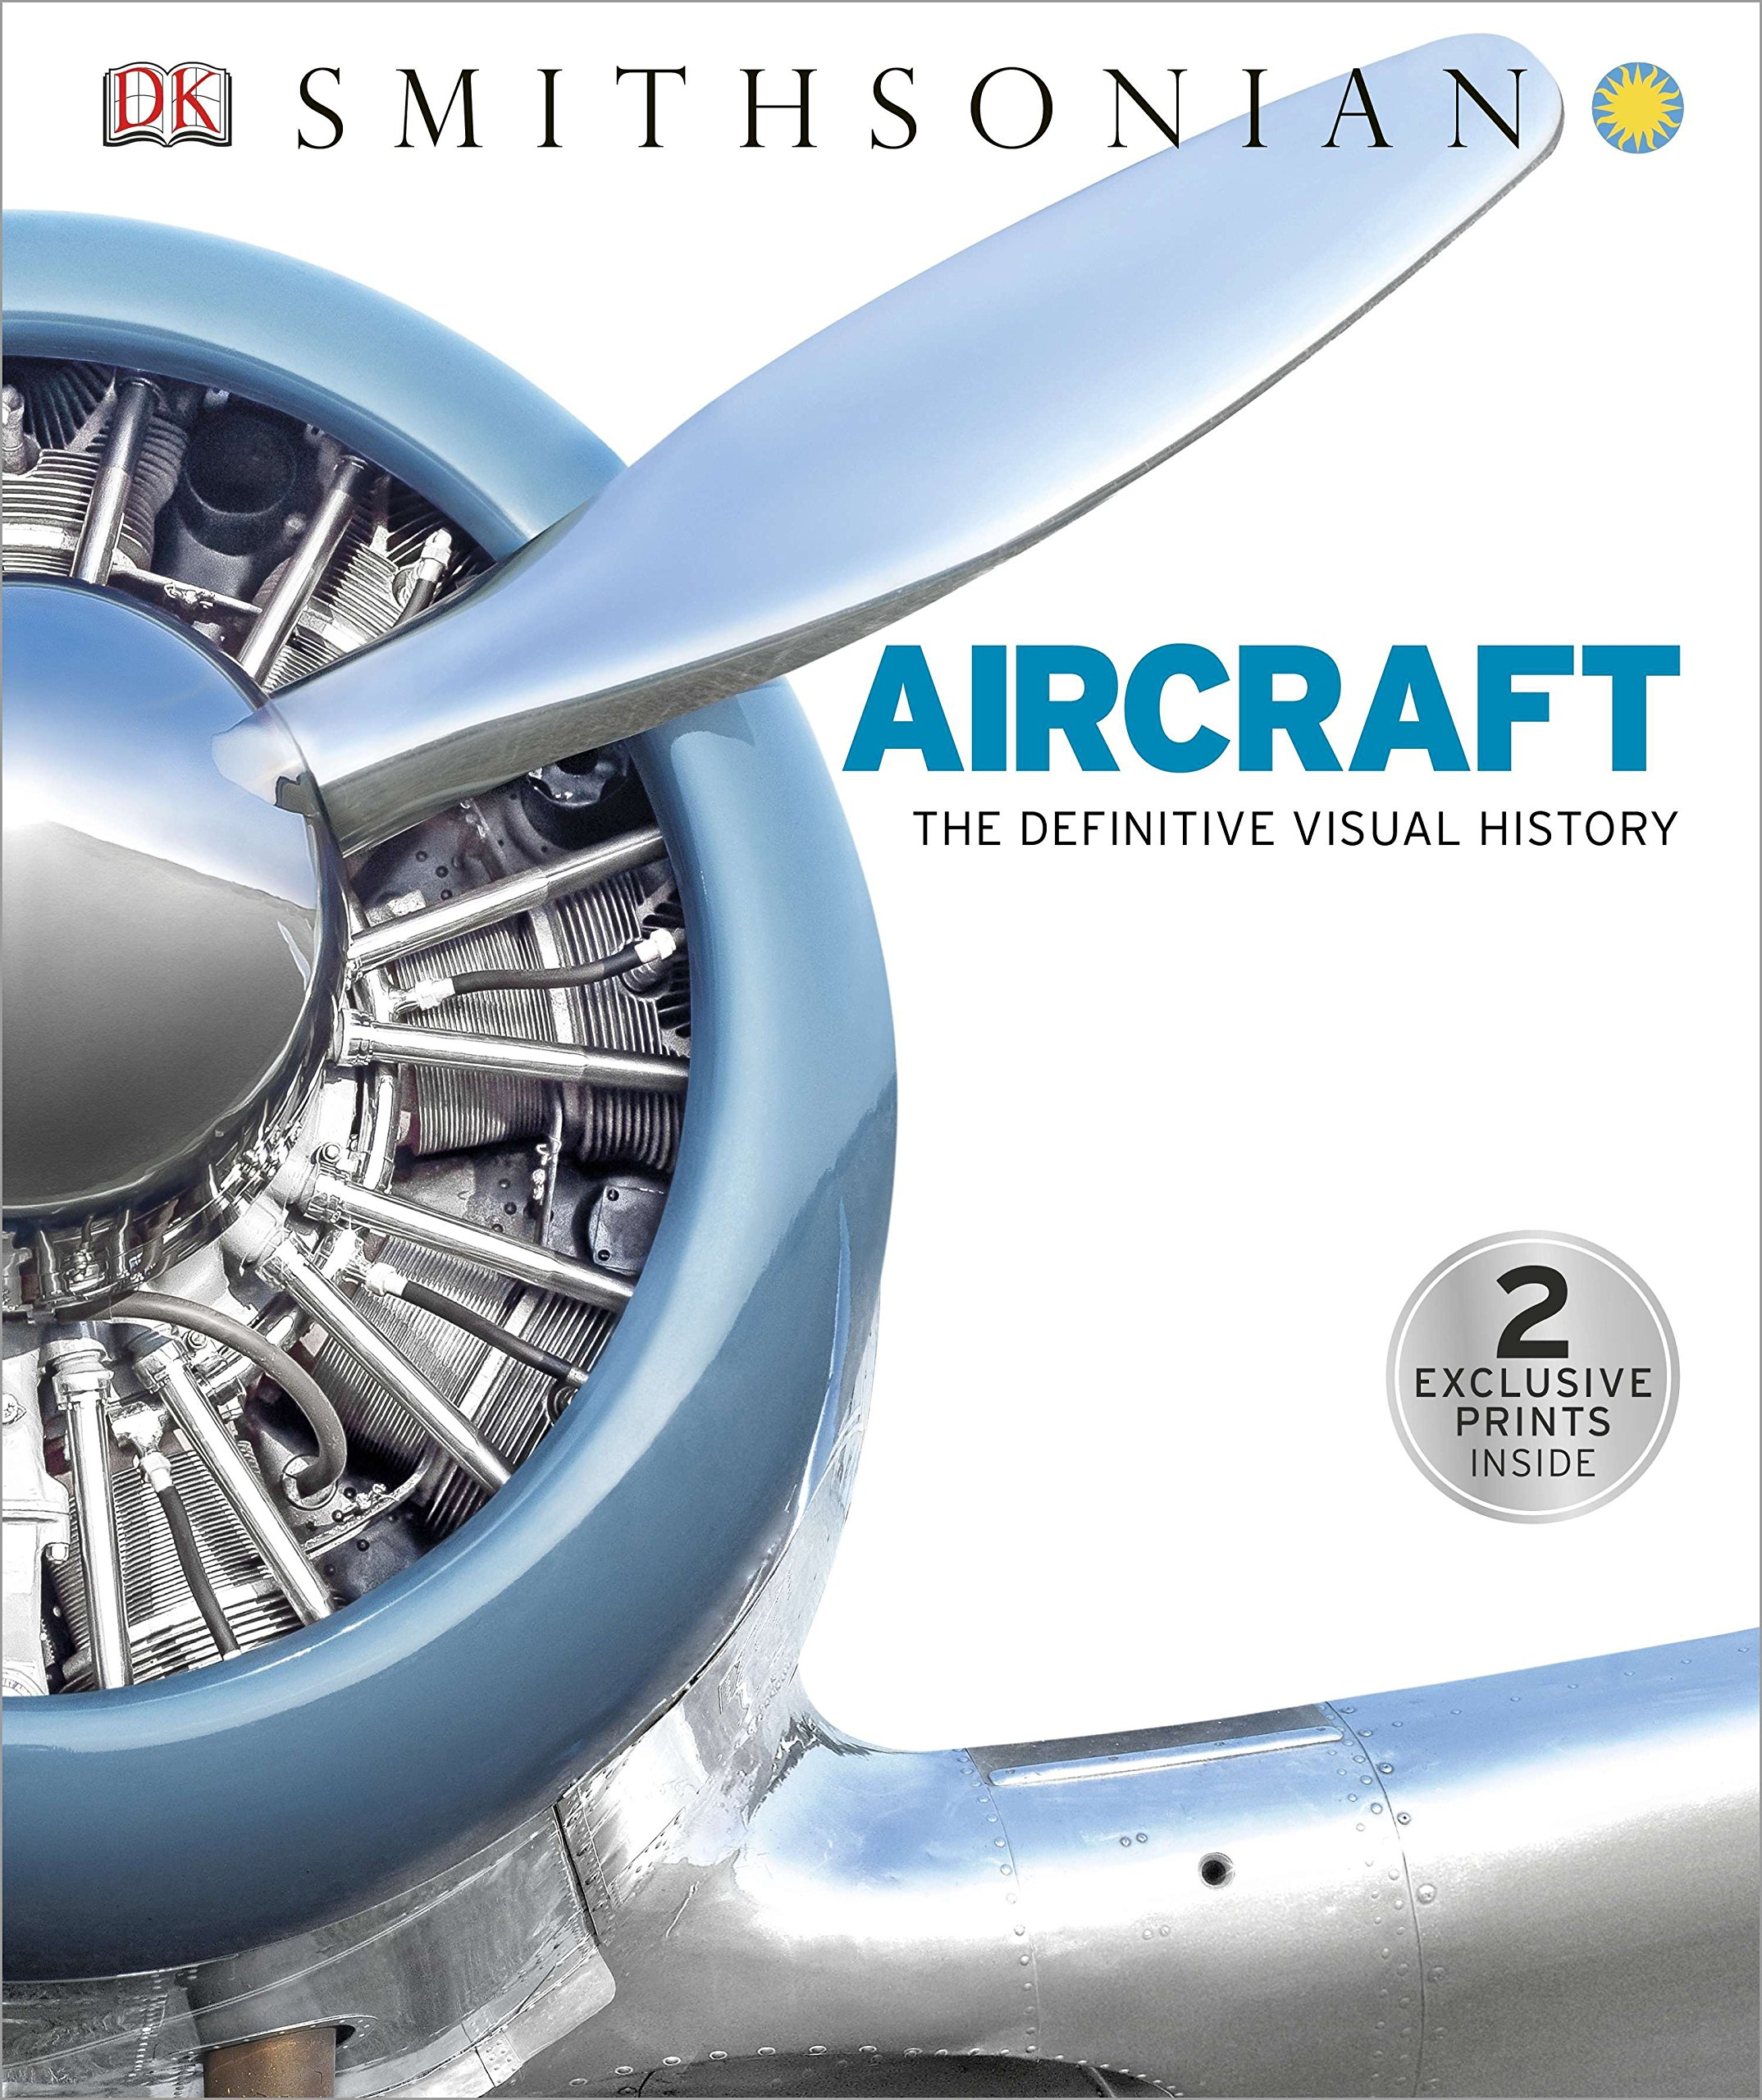 Aircraft: The Definitive Visual History by DK Publishing Dorling Kindersley